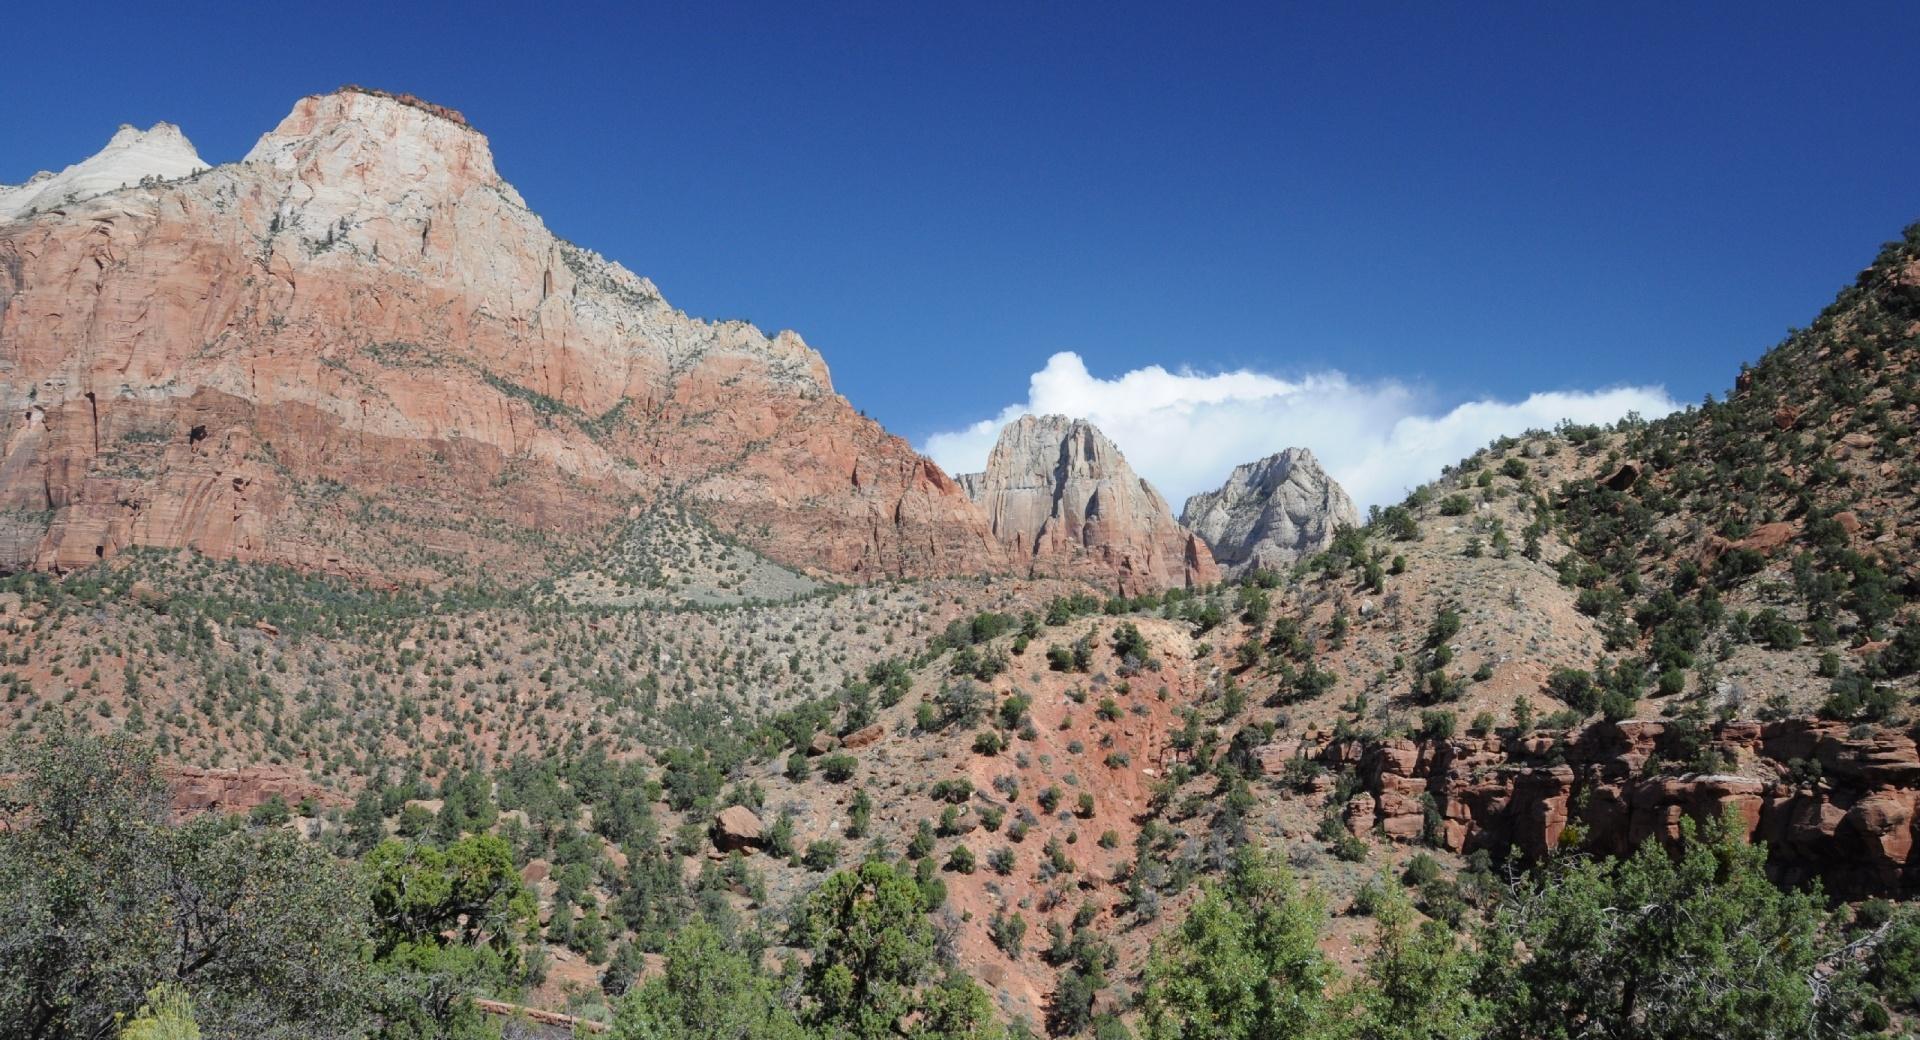 Desert Hills wallpapers HD quality